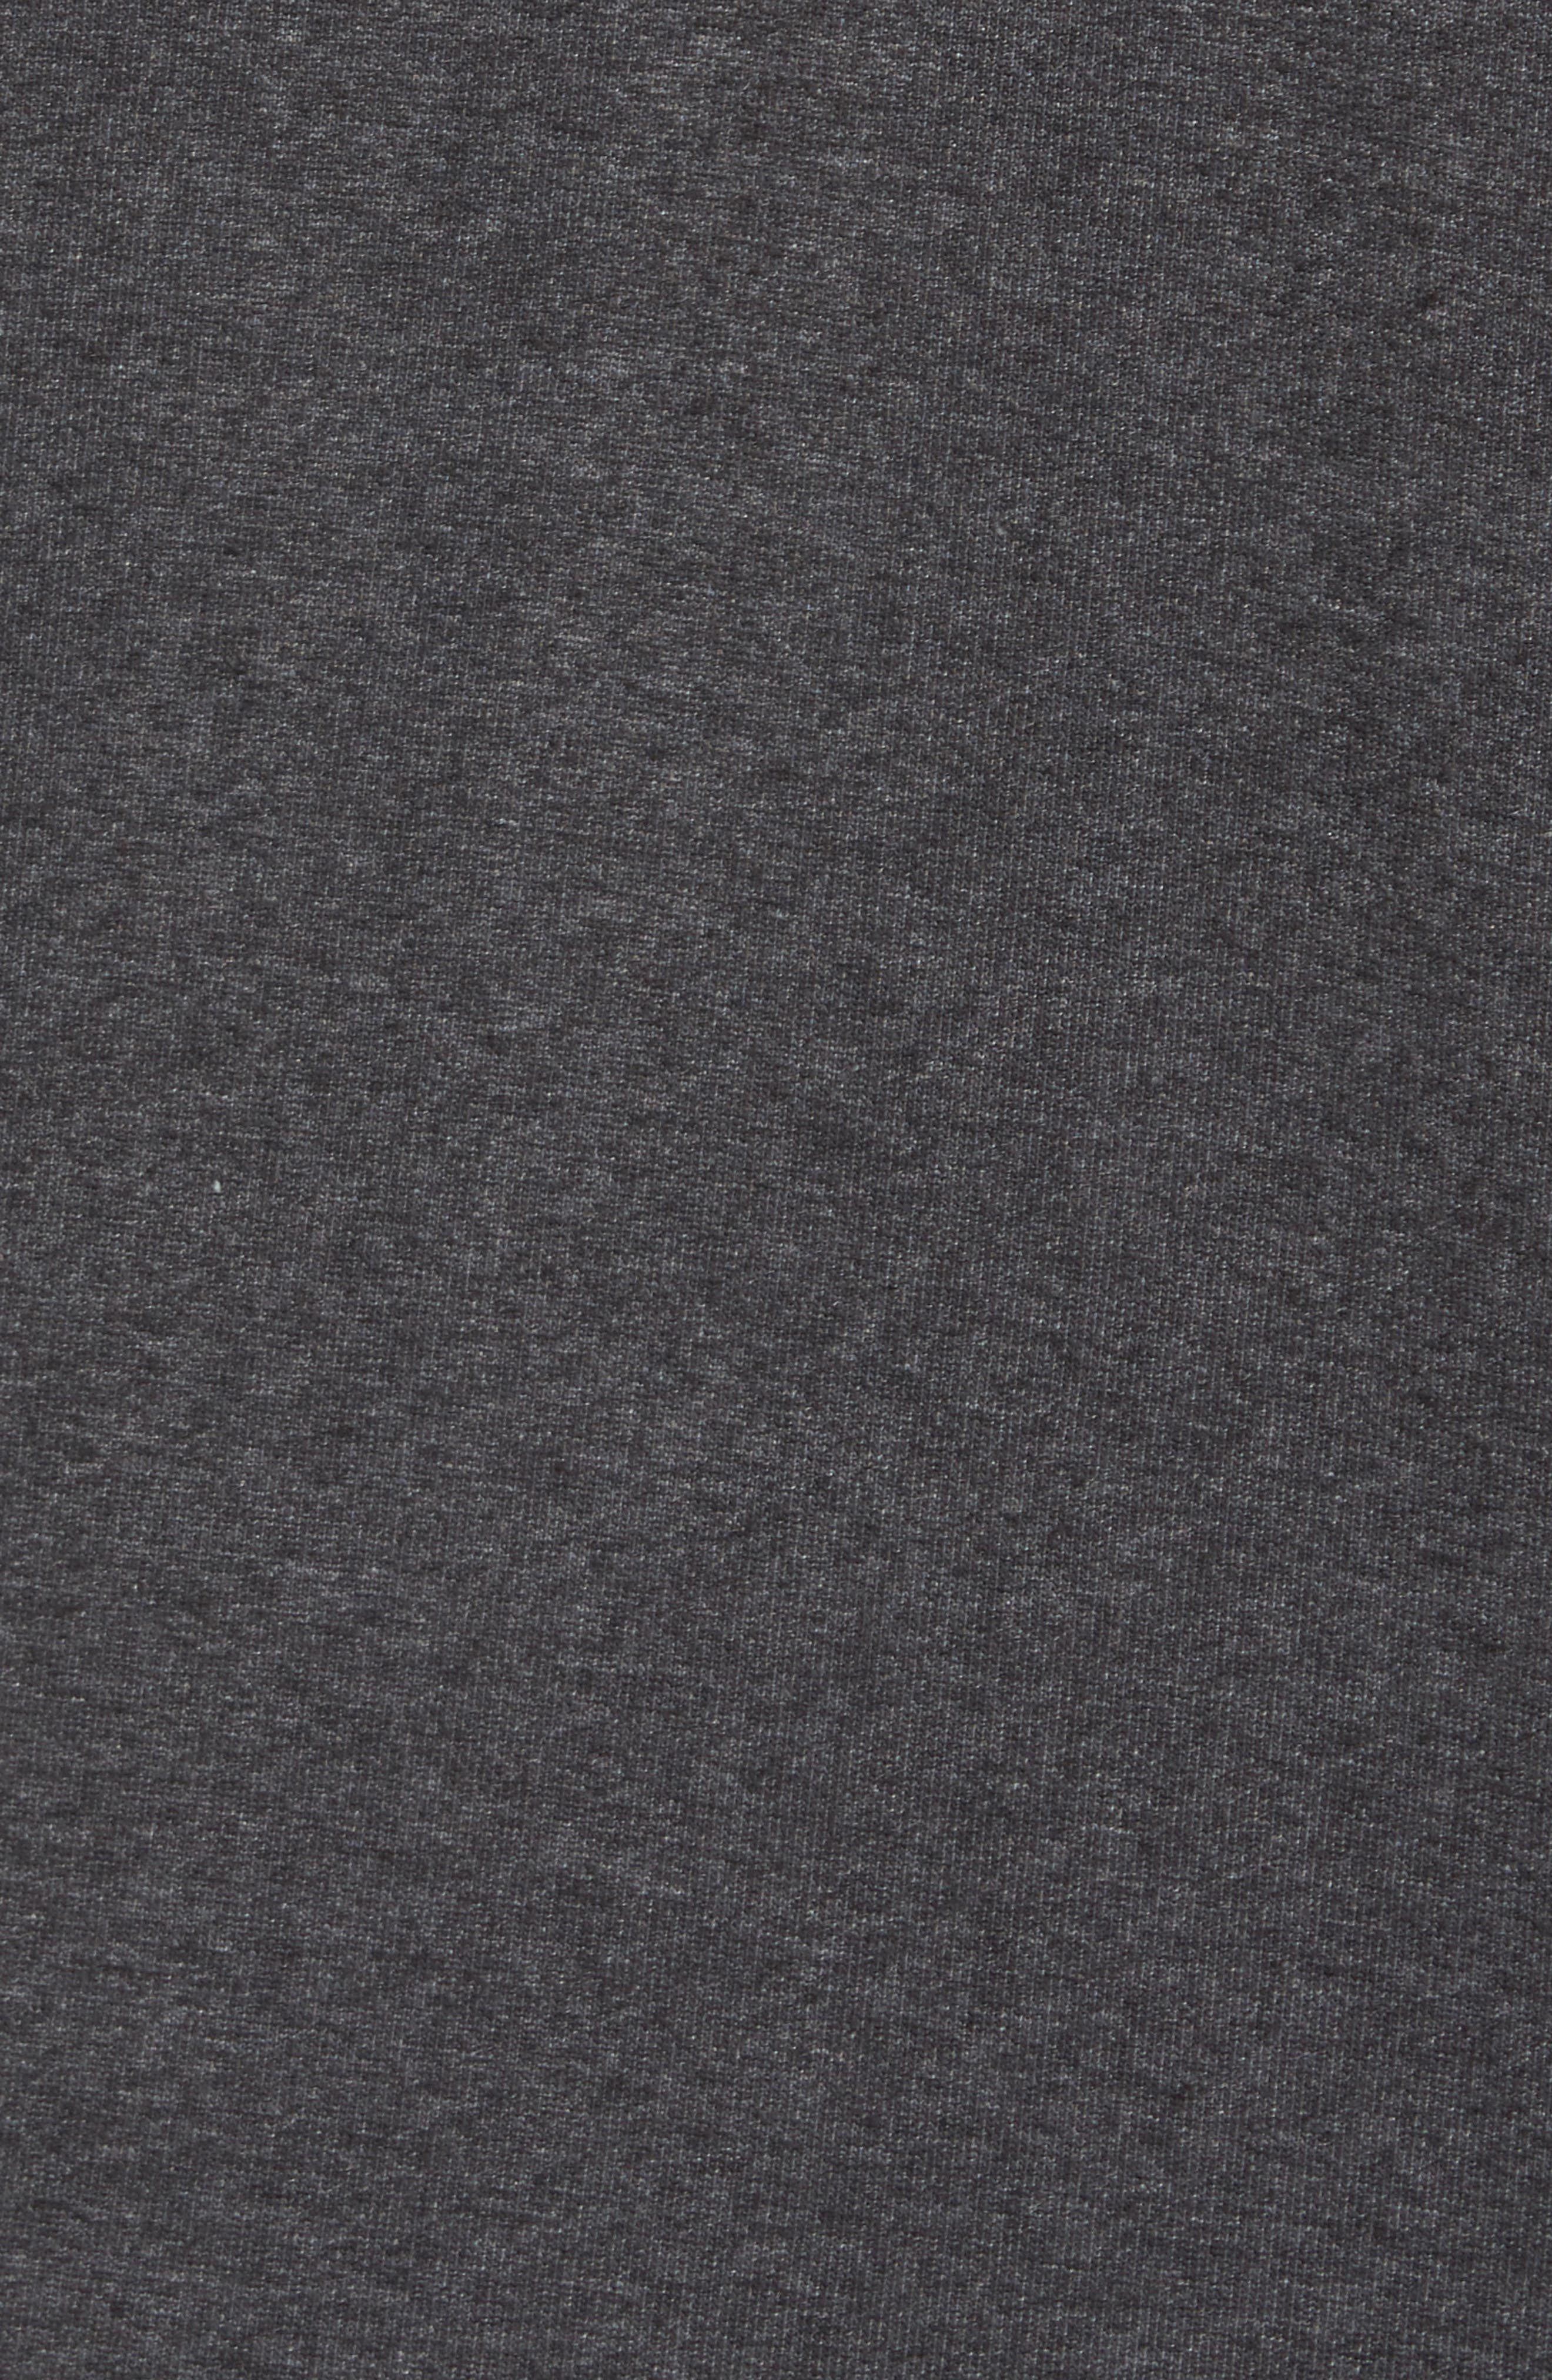 Fleece Zip Hoodie,                             Alternate thumbnail 5, color,                             Grey Charcoal Heather